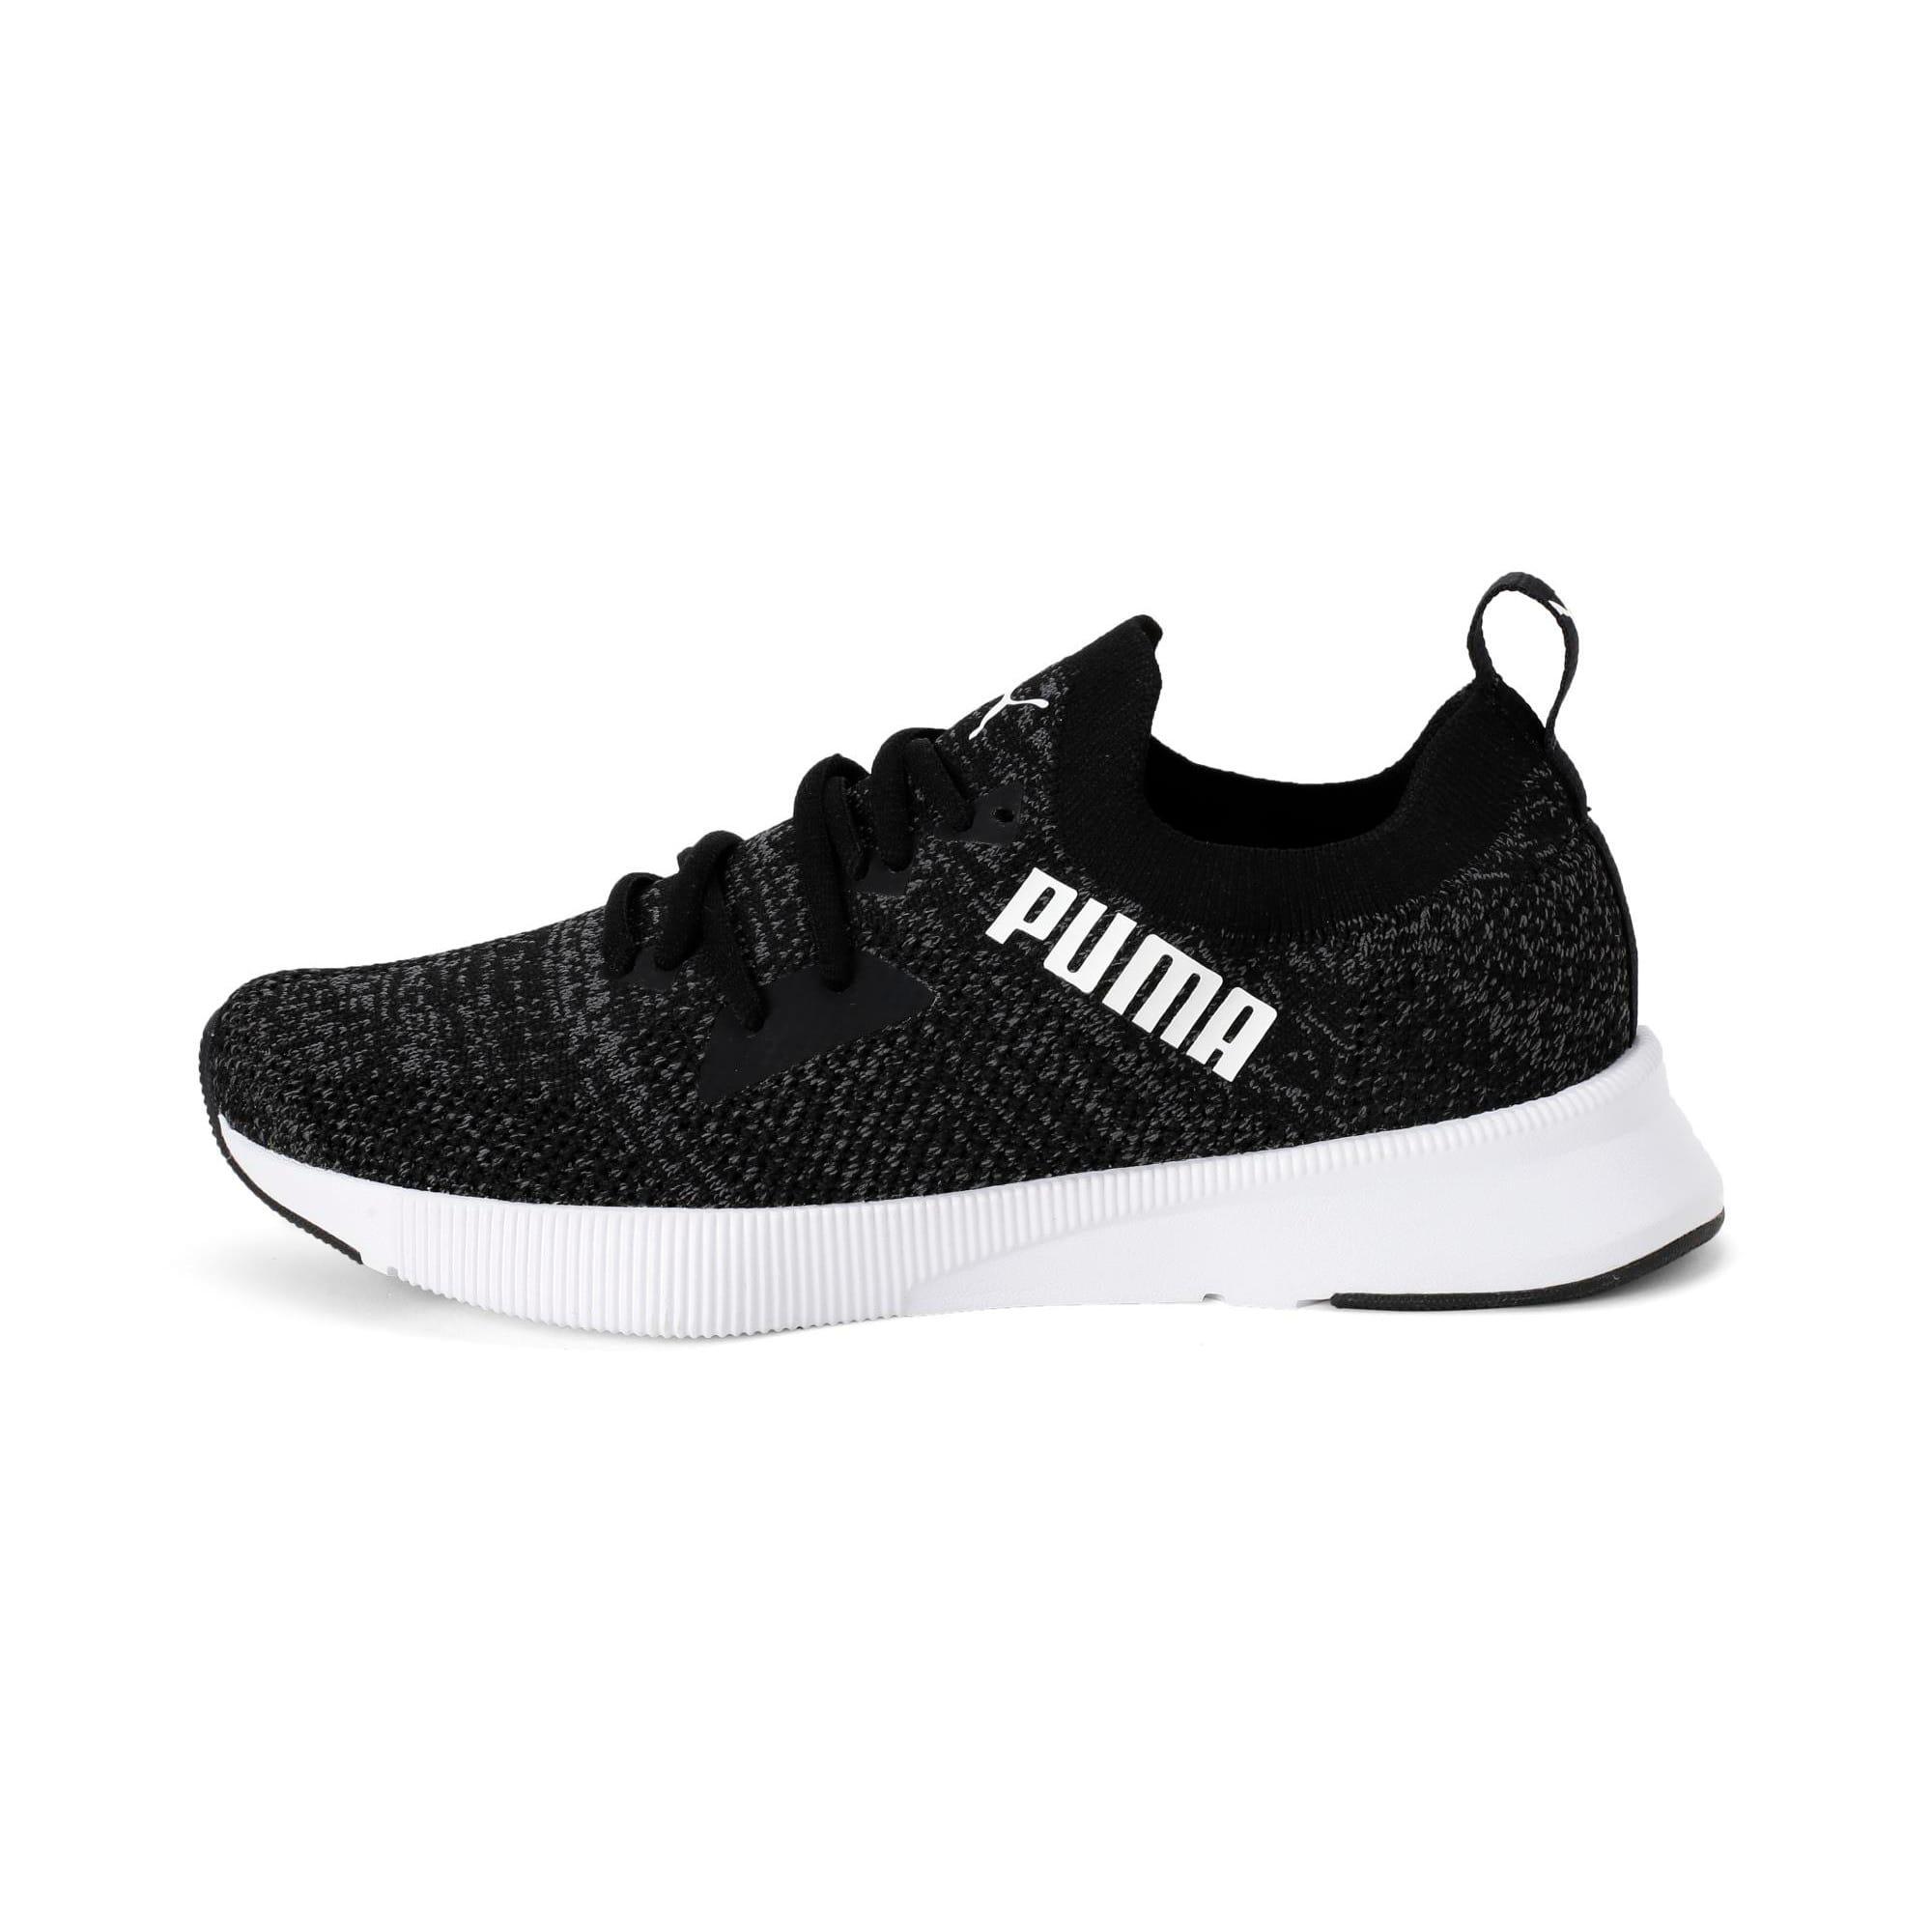 Thumbnail 1 of Flyer Women's Running Shoes, Puma Blk-Asphalt-Puma Wht, medium-IND